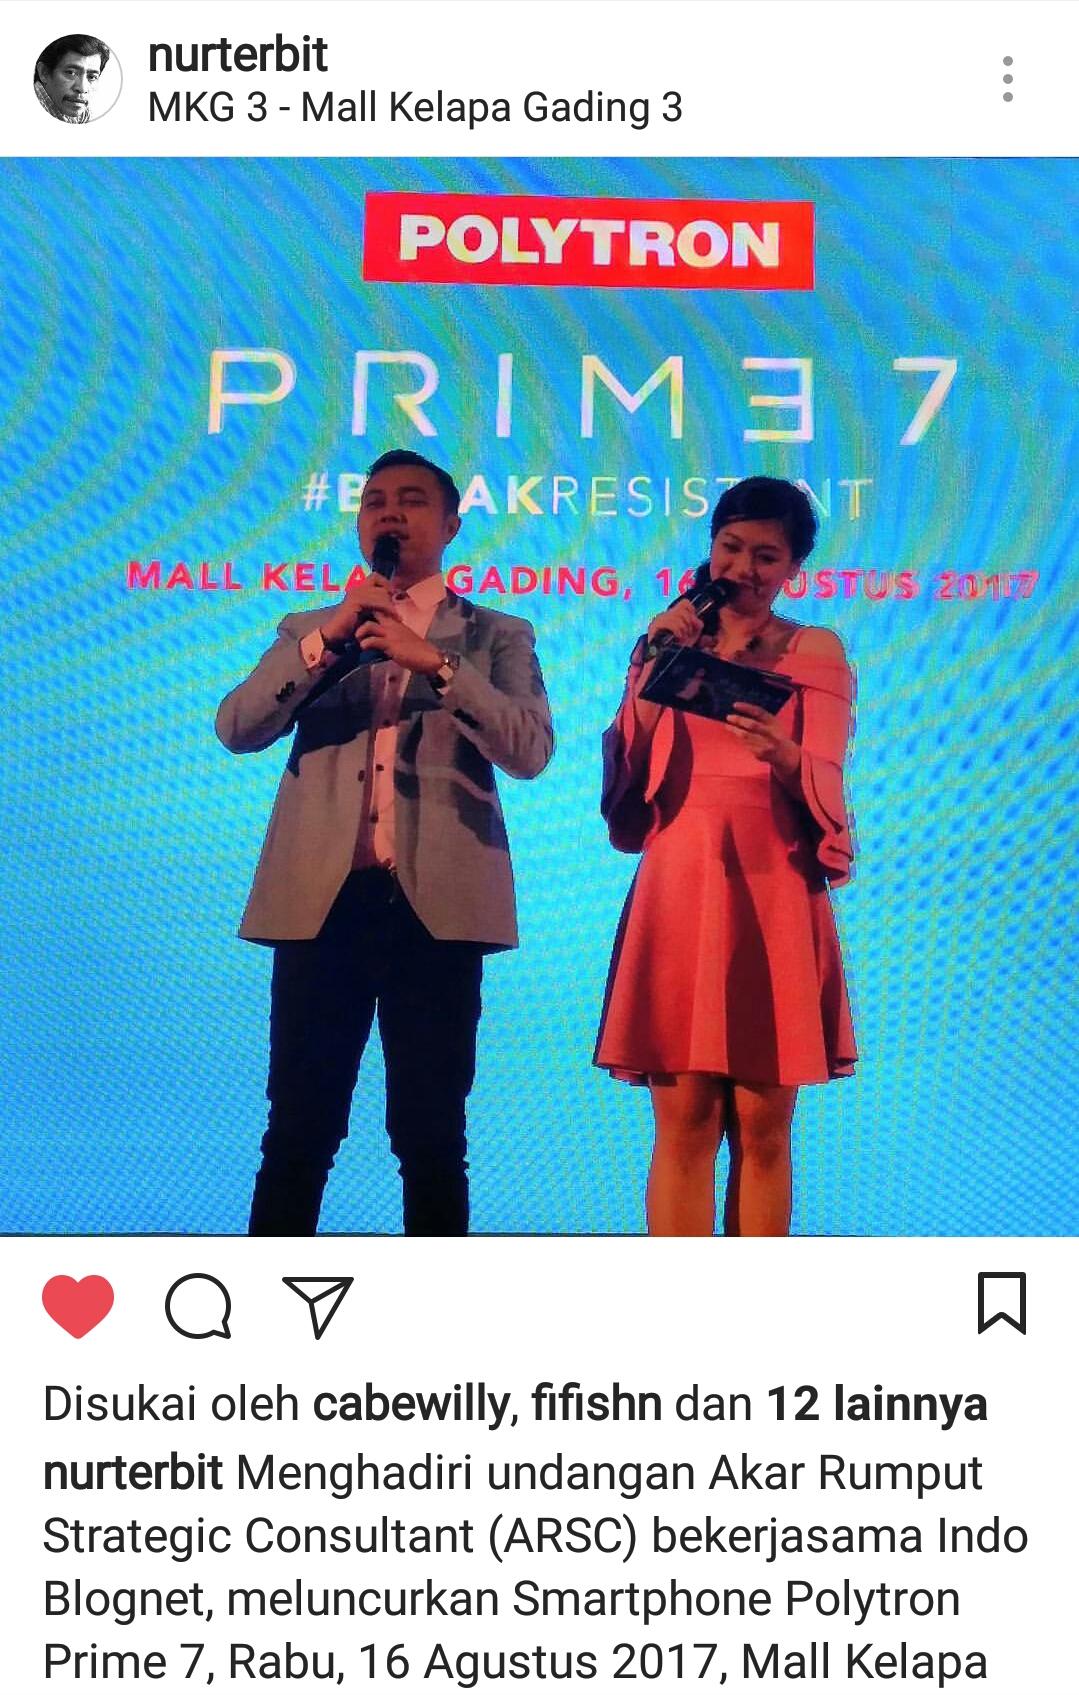 Instagram Nur Terbit